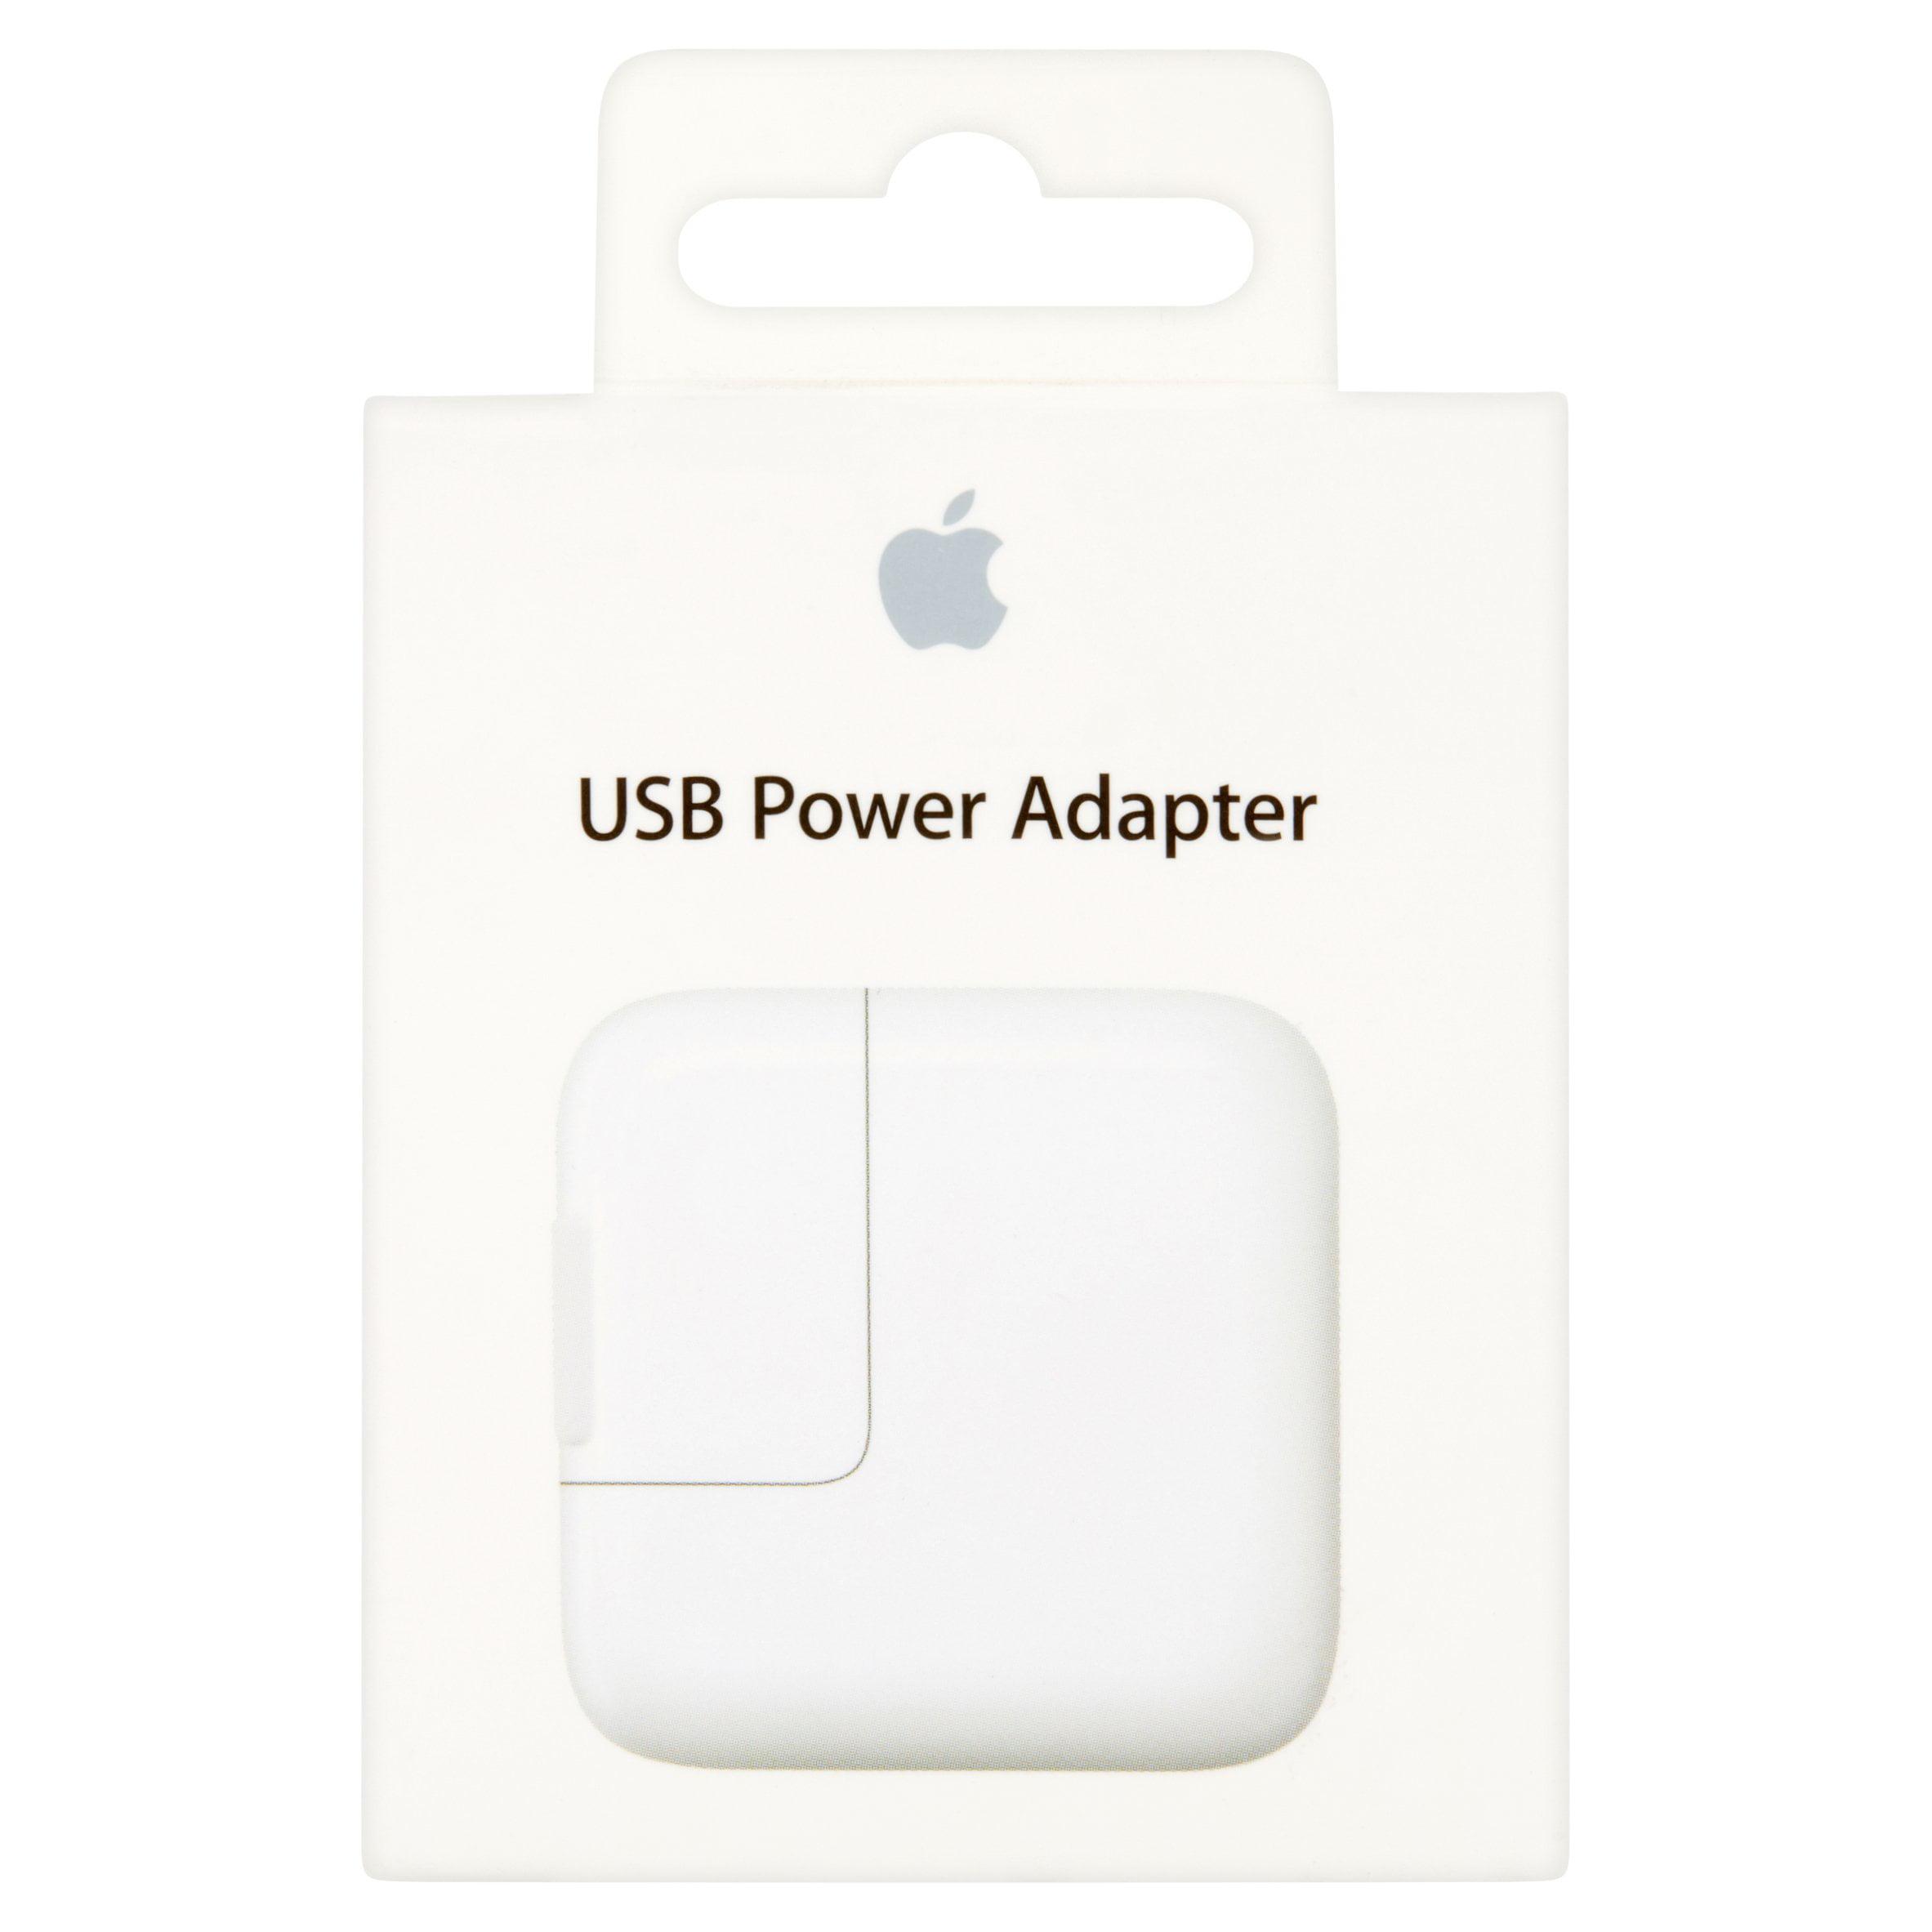 apple genuine oem 12w usb power travel wall adapter walmart com